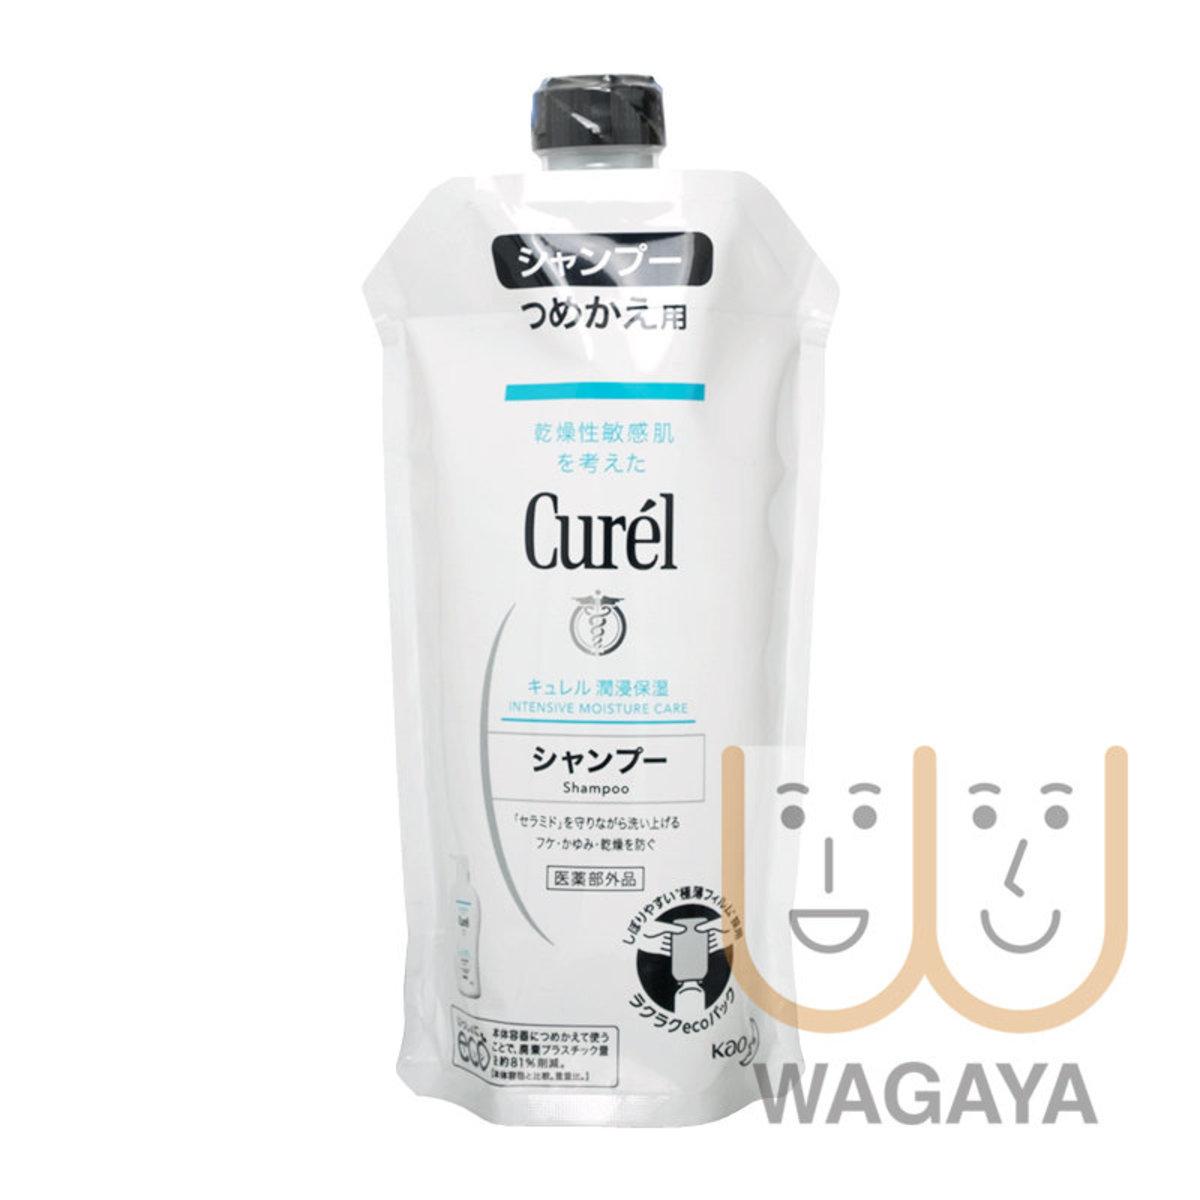 Intensive Moisture Care Shampoo (Refill) 340ml NEW  (Parallel Import)